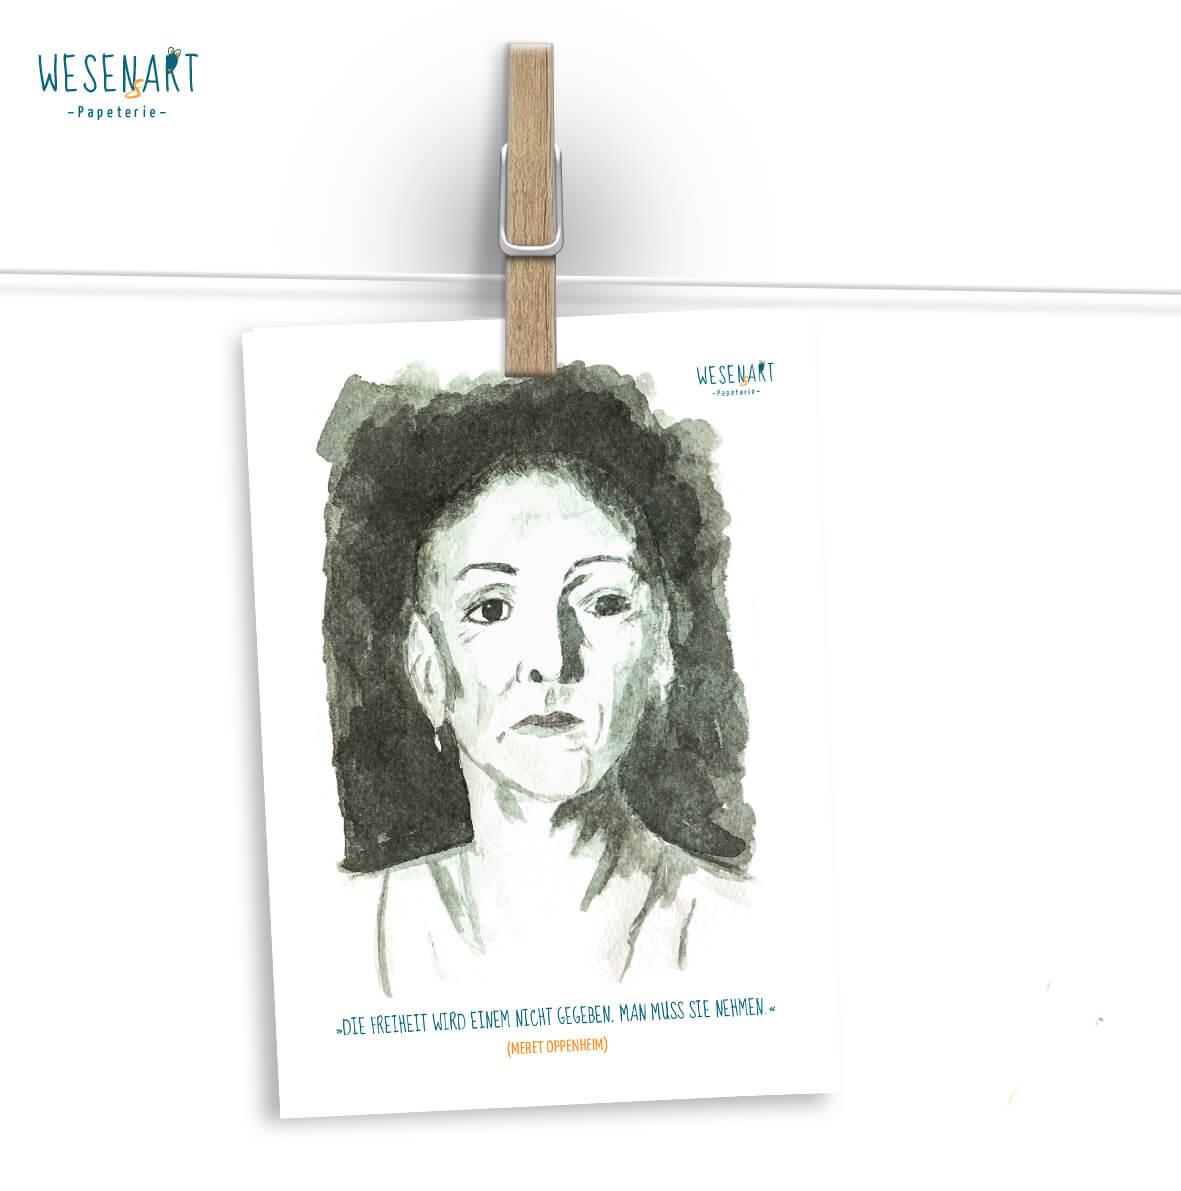 Meret Oppenheim im WESENsART Postkarten-Adventskalender 2018.